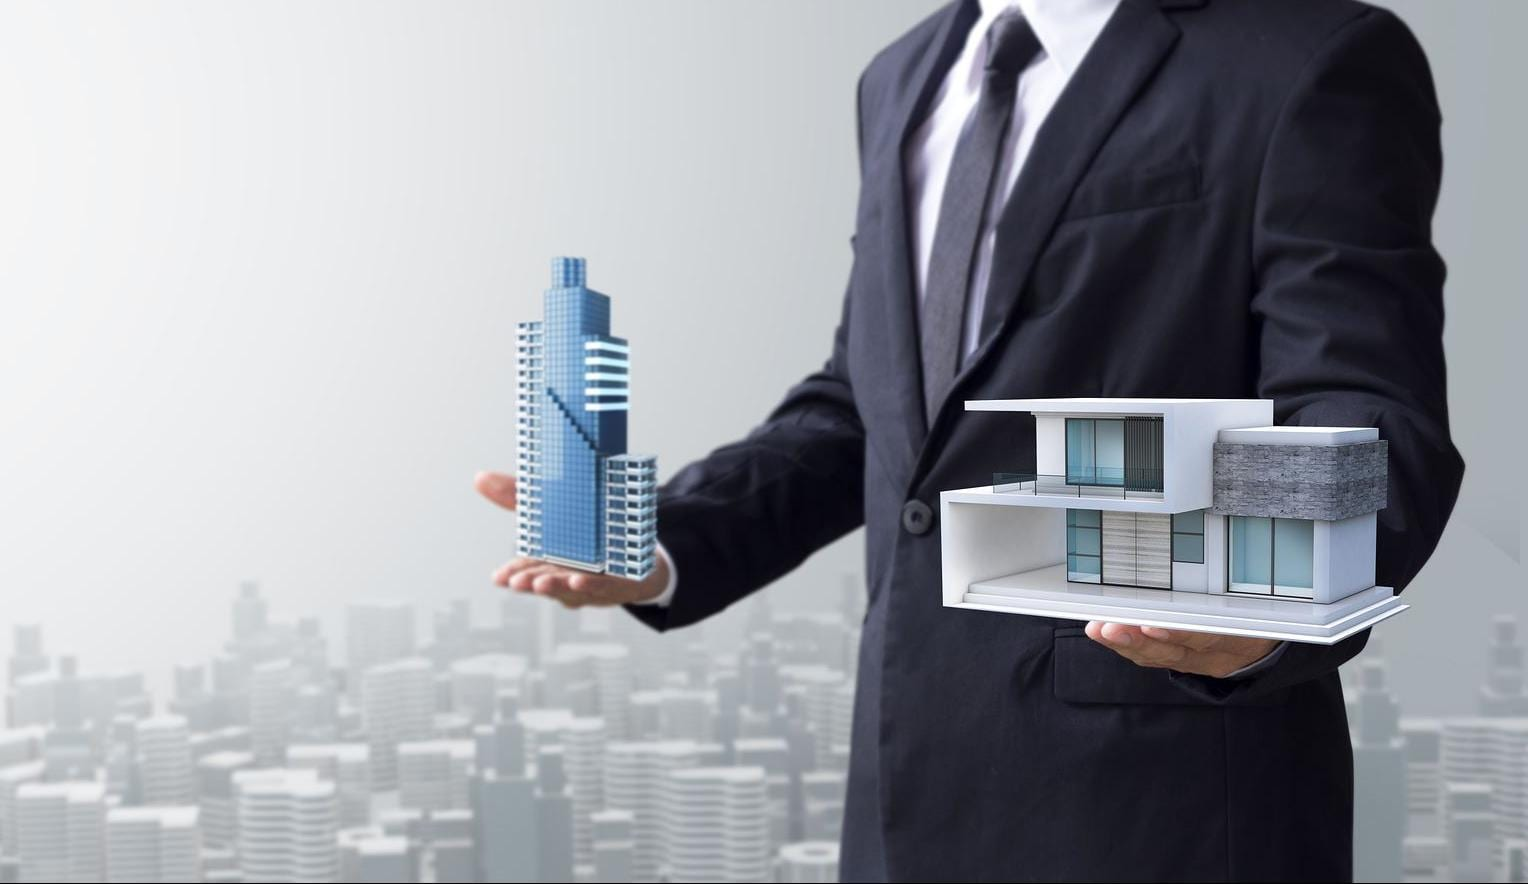 Commercial - bigstock-Business-Man-Select-Modern-Hou-190646428-e1535217901956